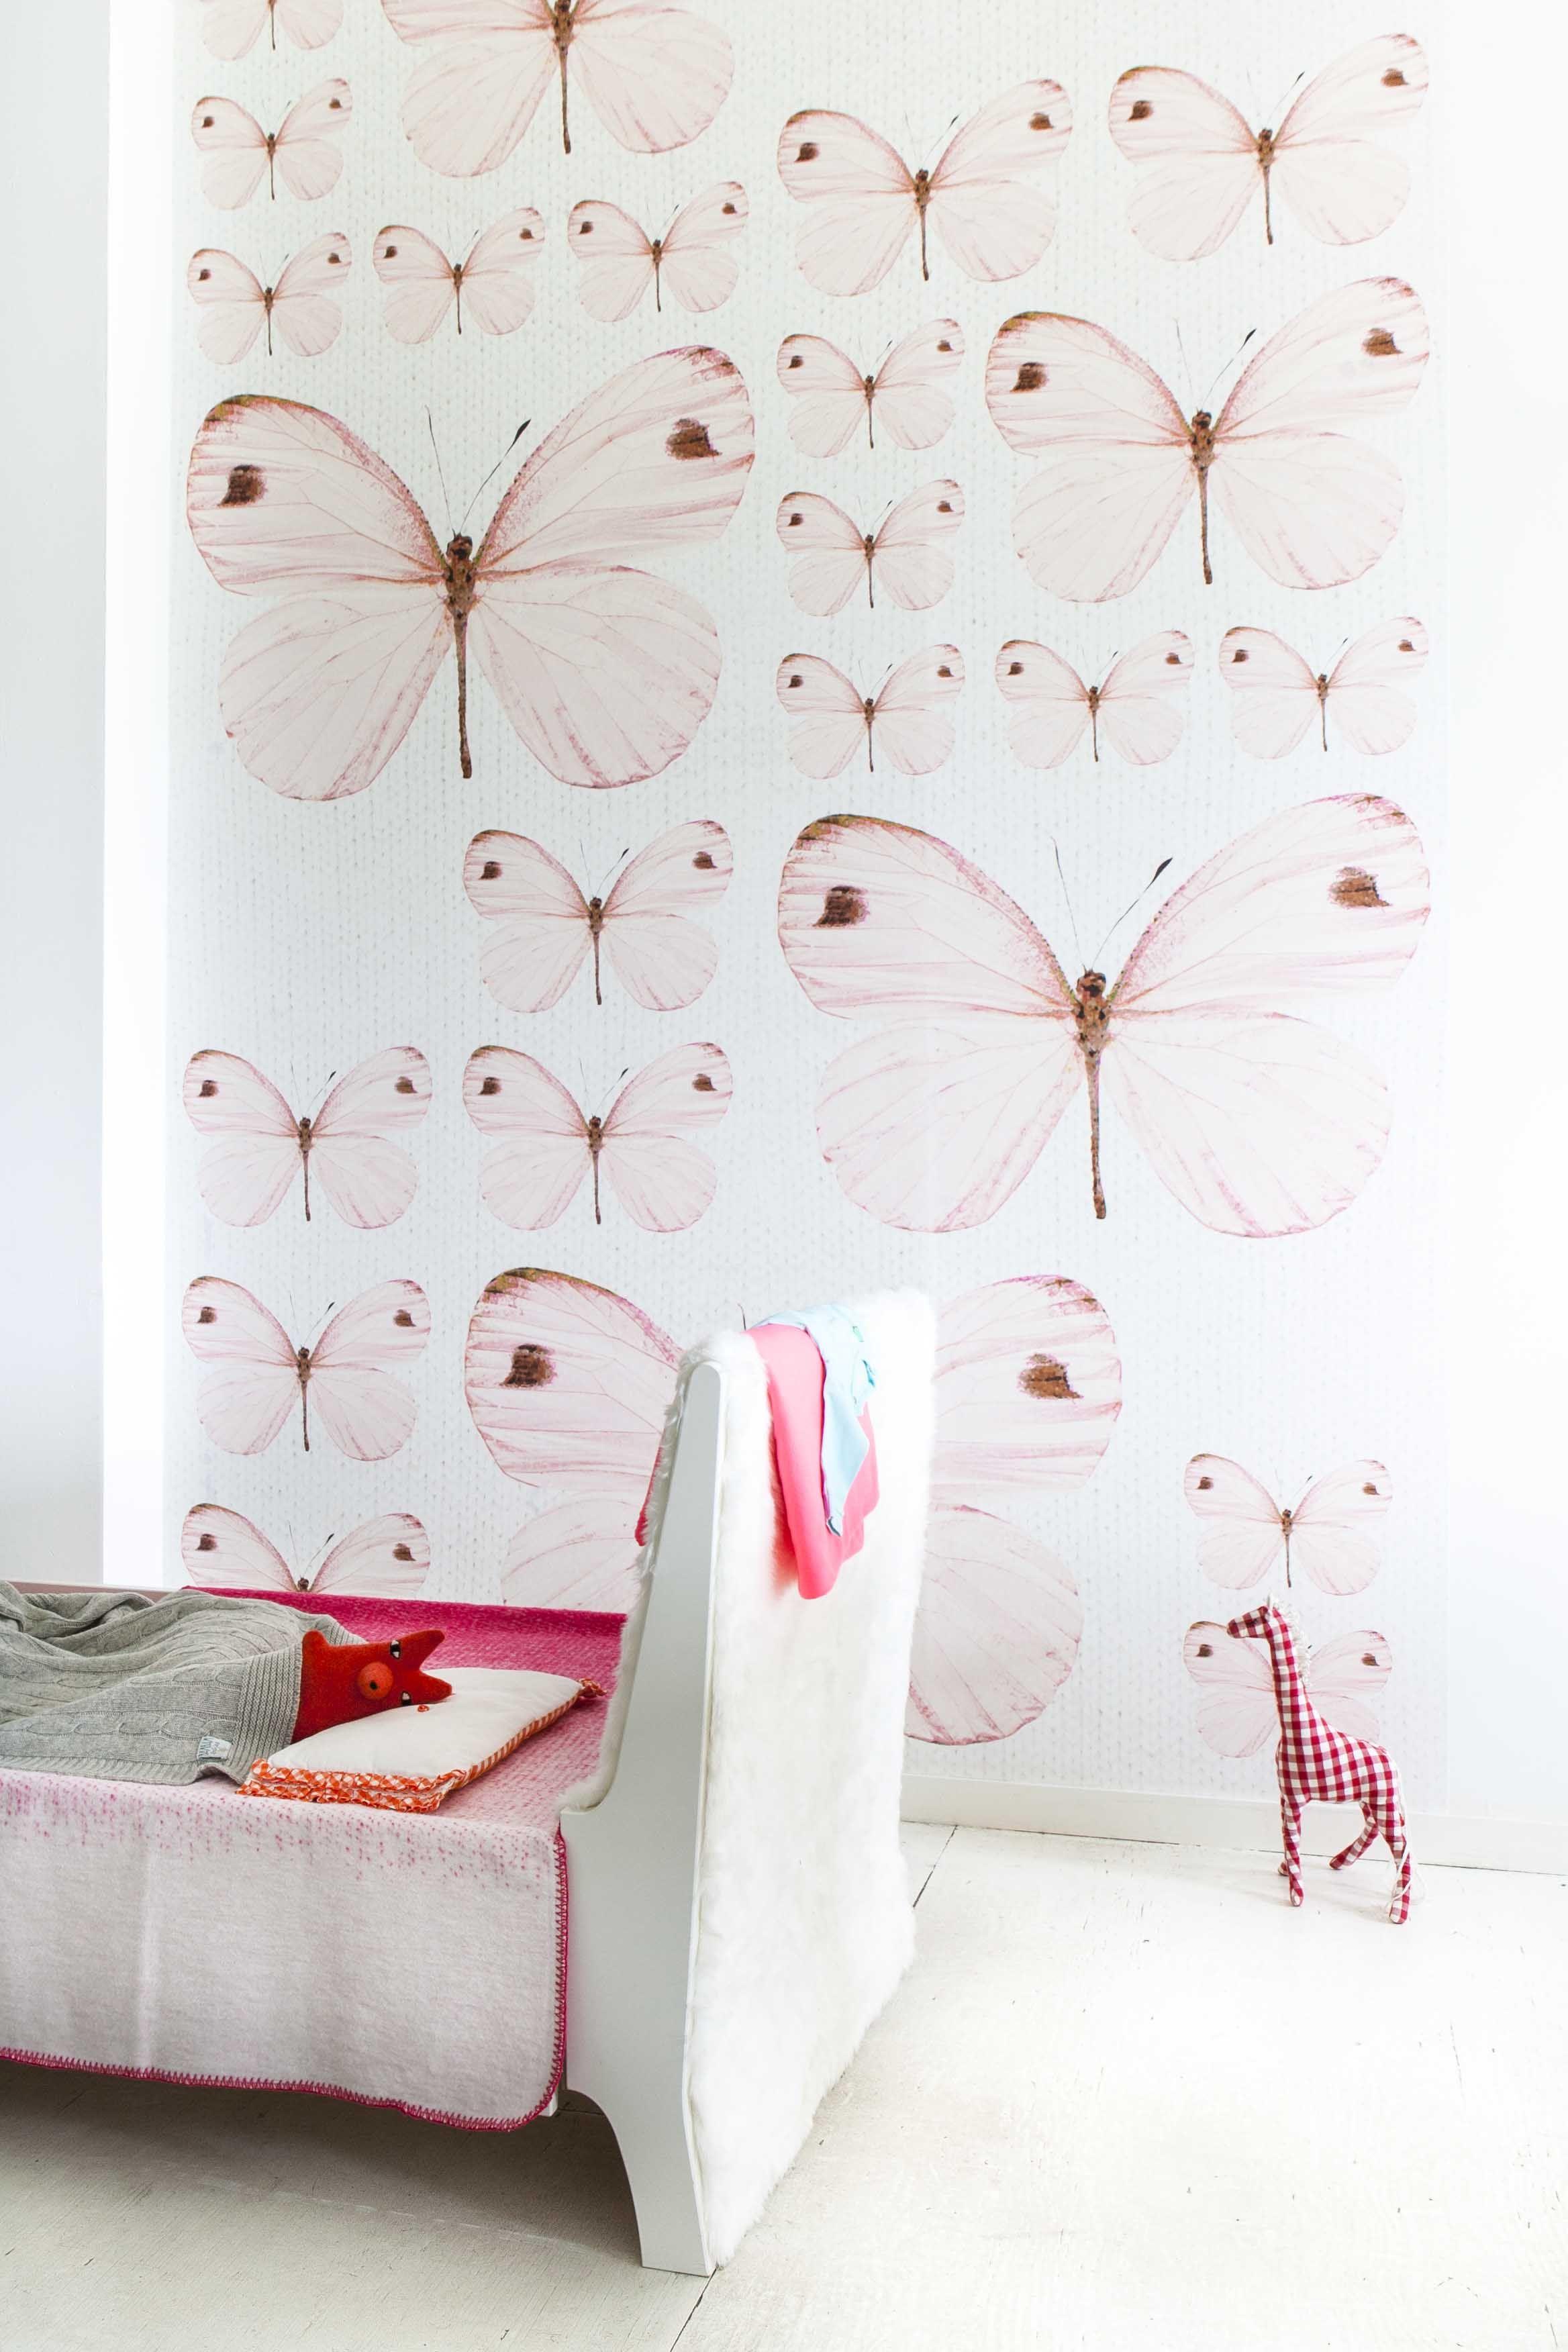 Behang Kinderkamer Roze.Butterflies On The Walls Inspiratie Behang Kinderkamer